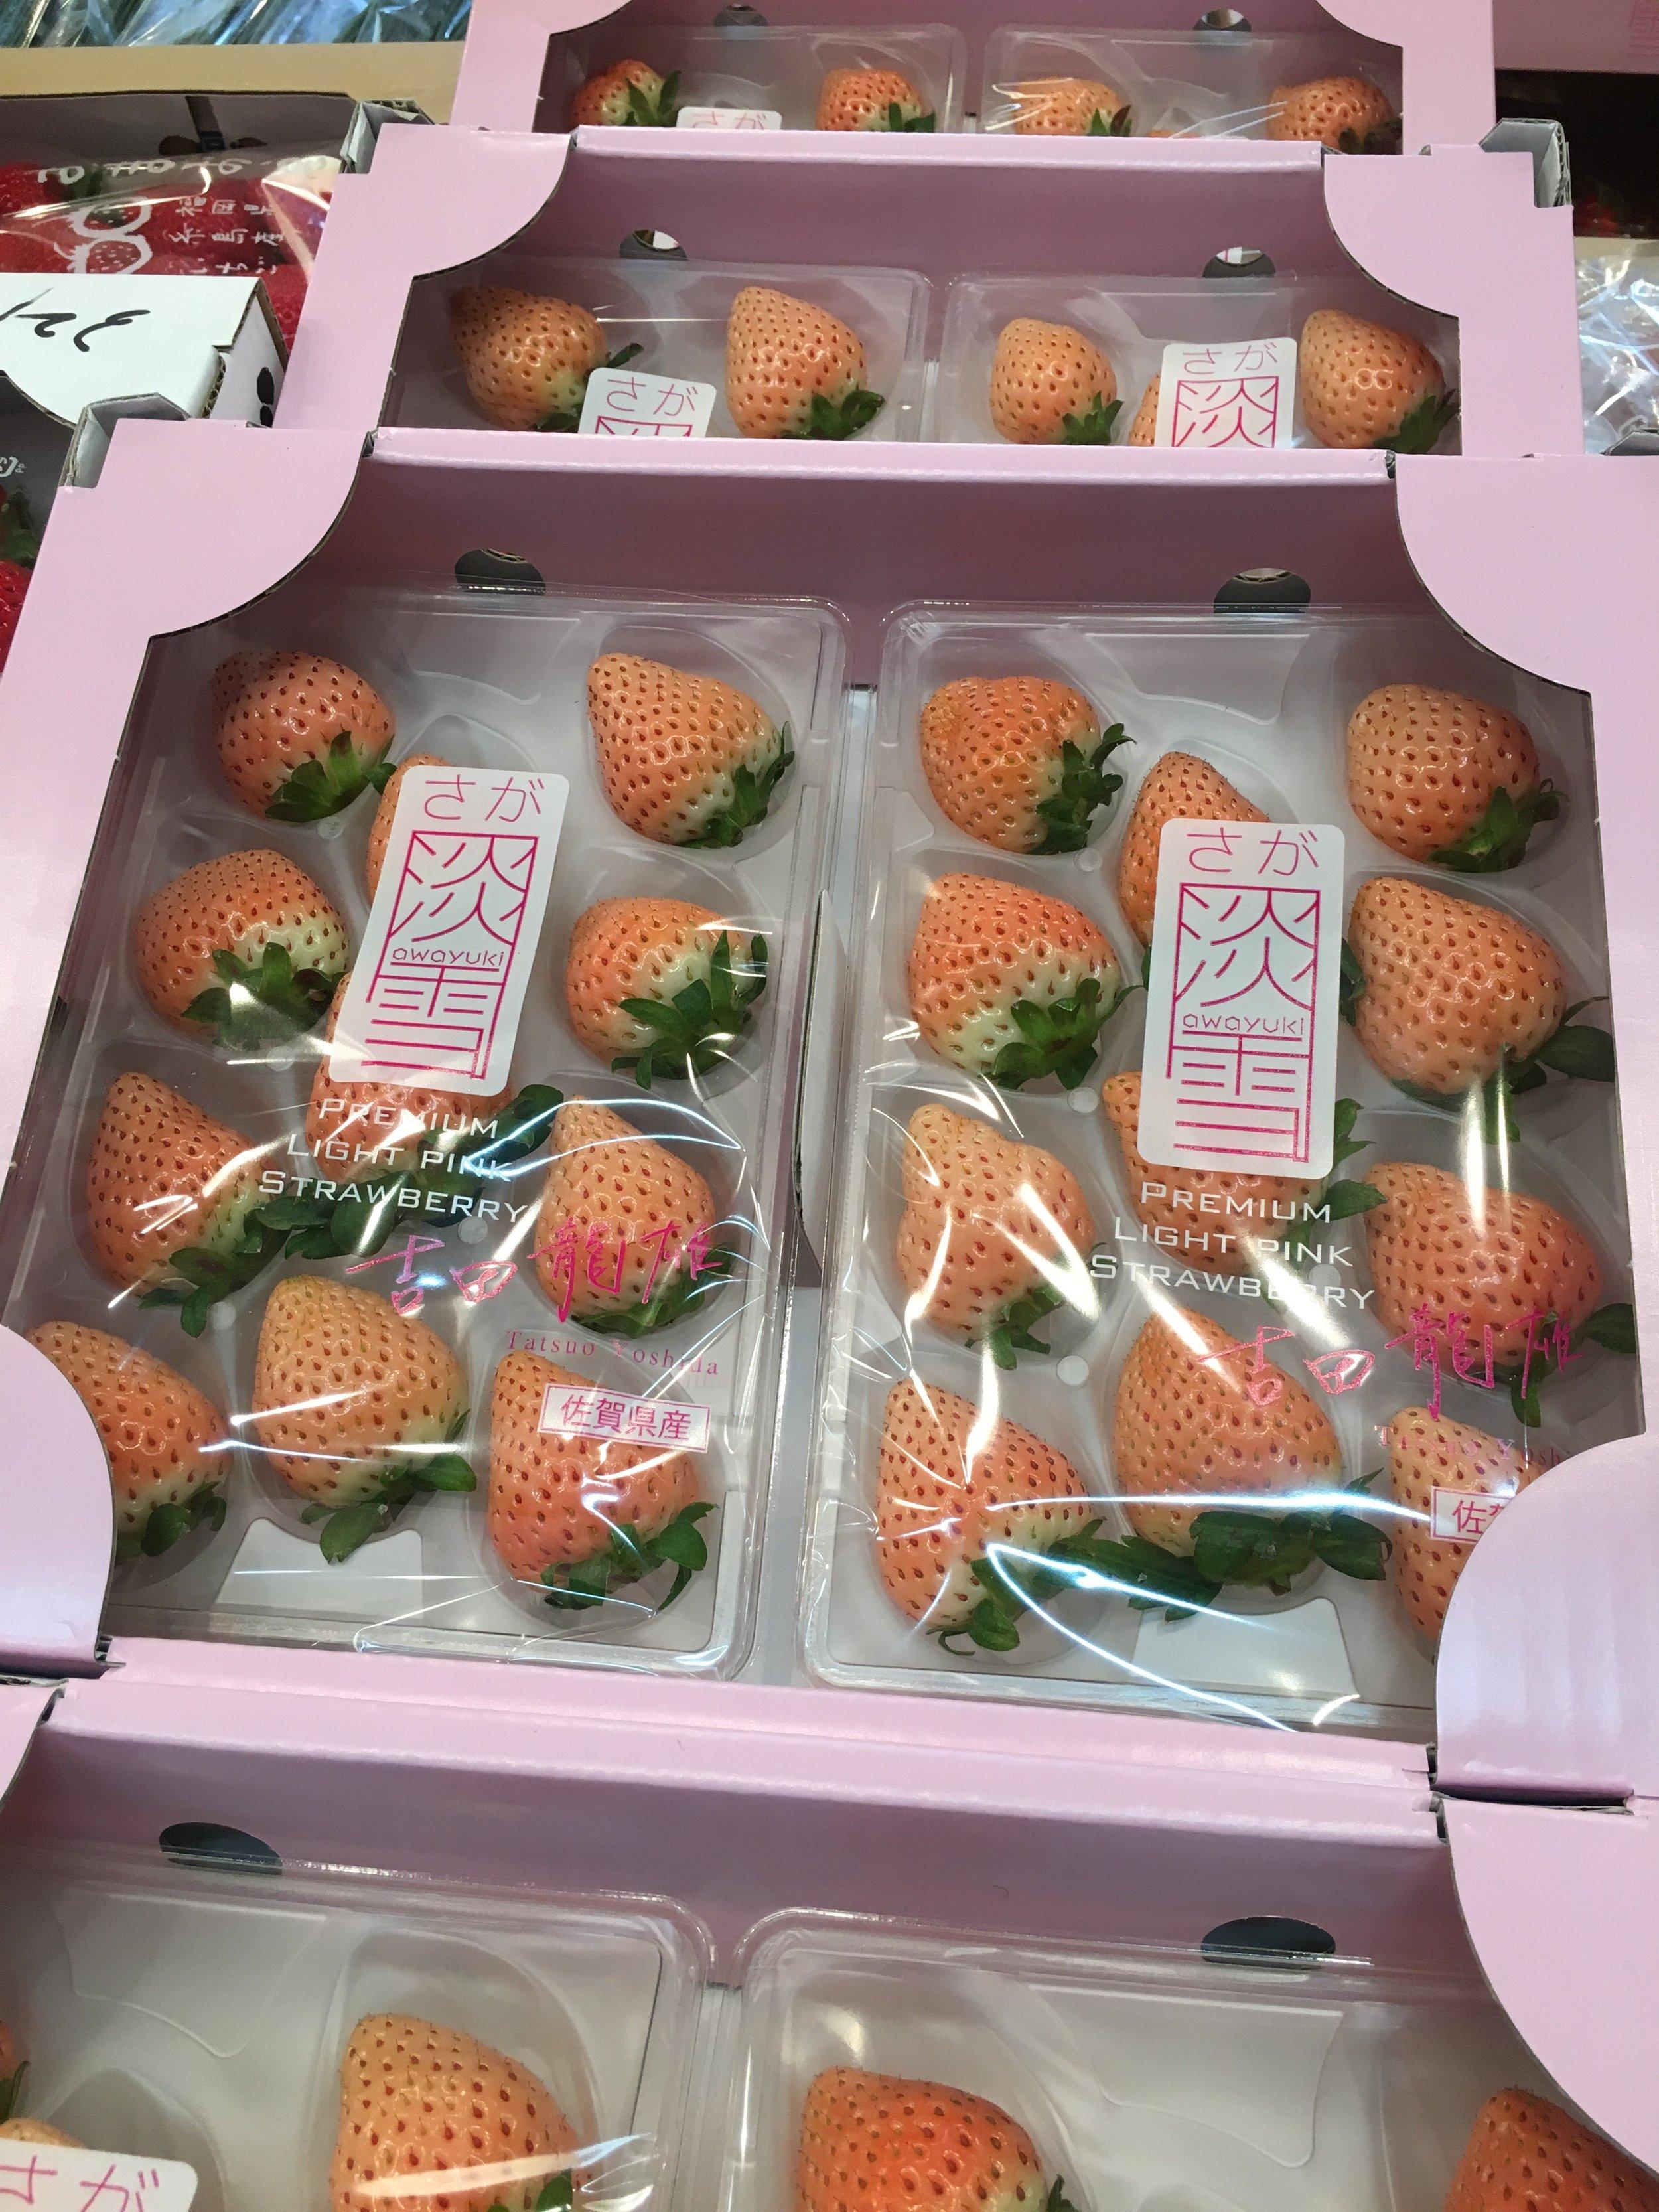 Saga light snow strawberry